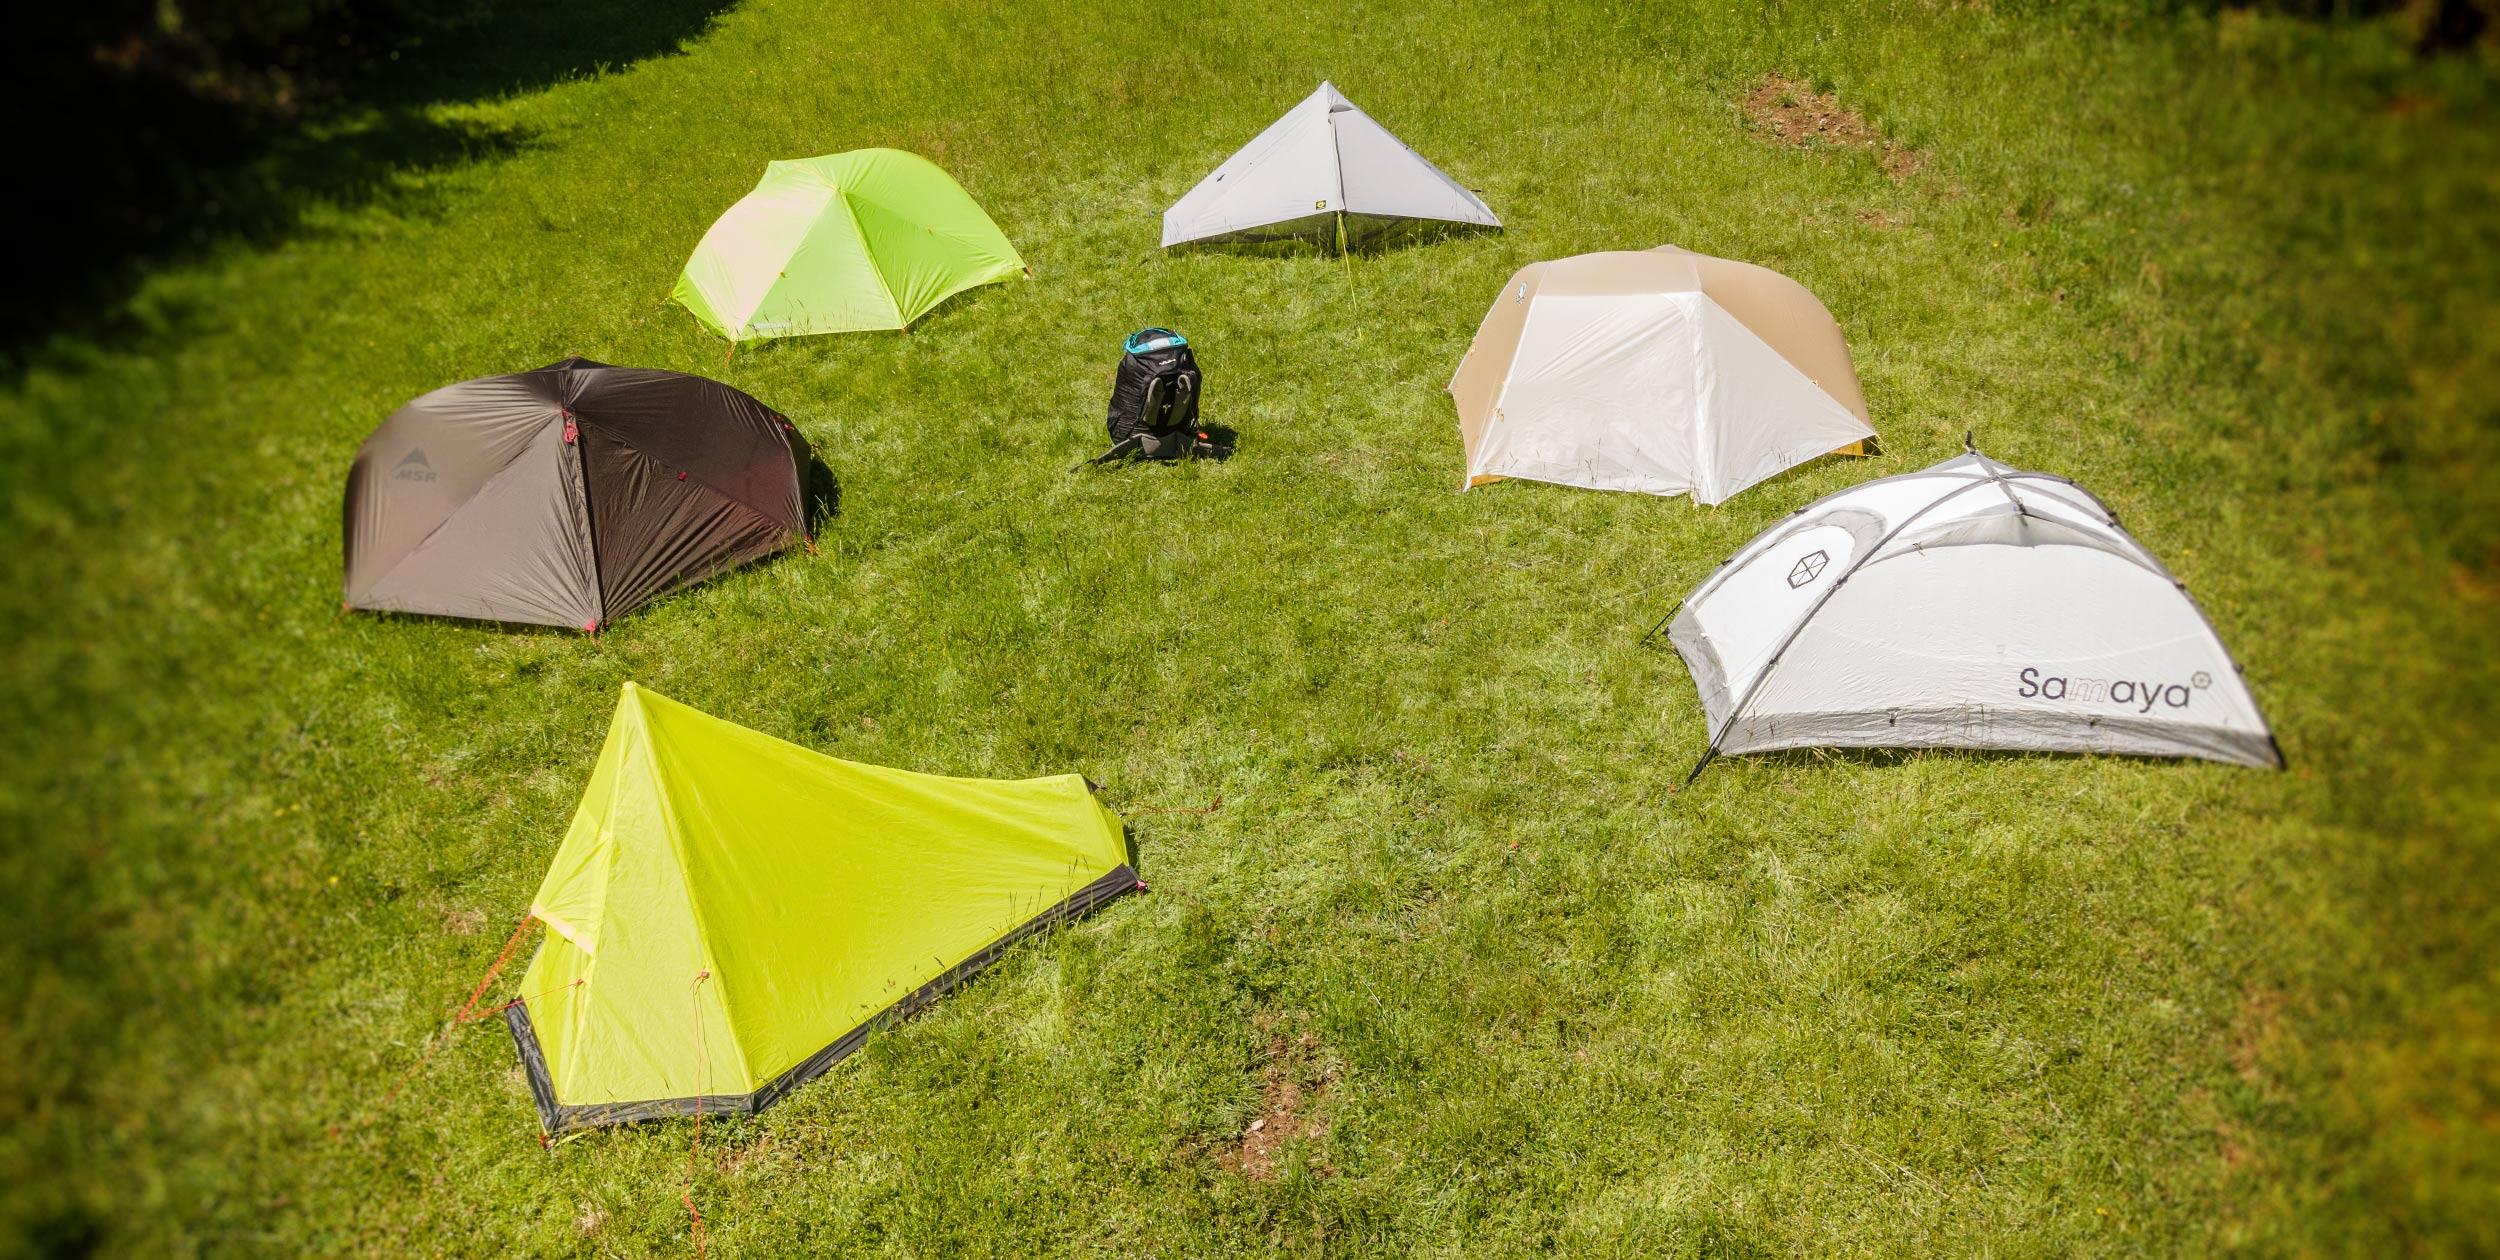 Vol-biv shelter roundup